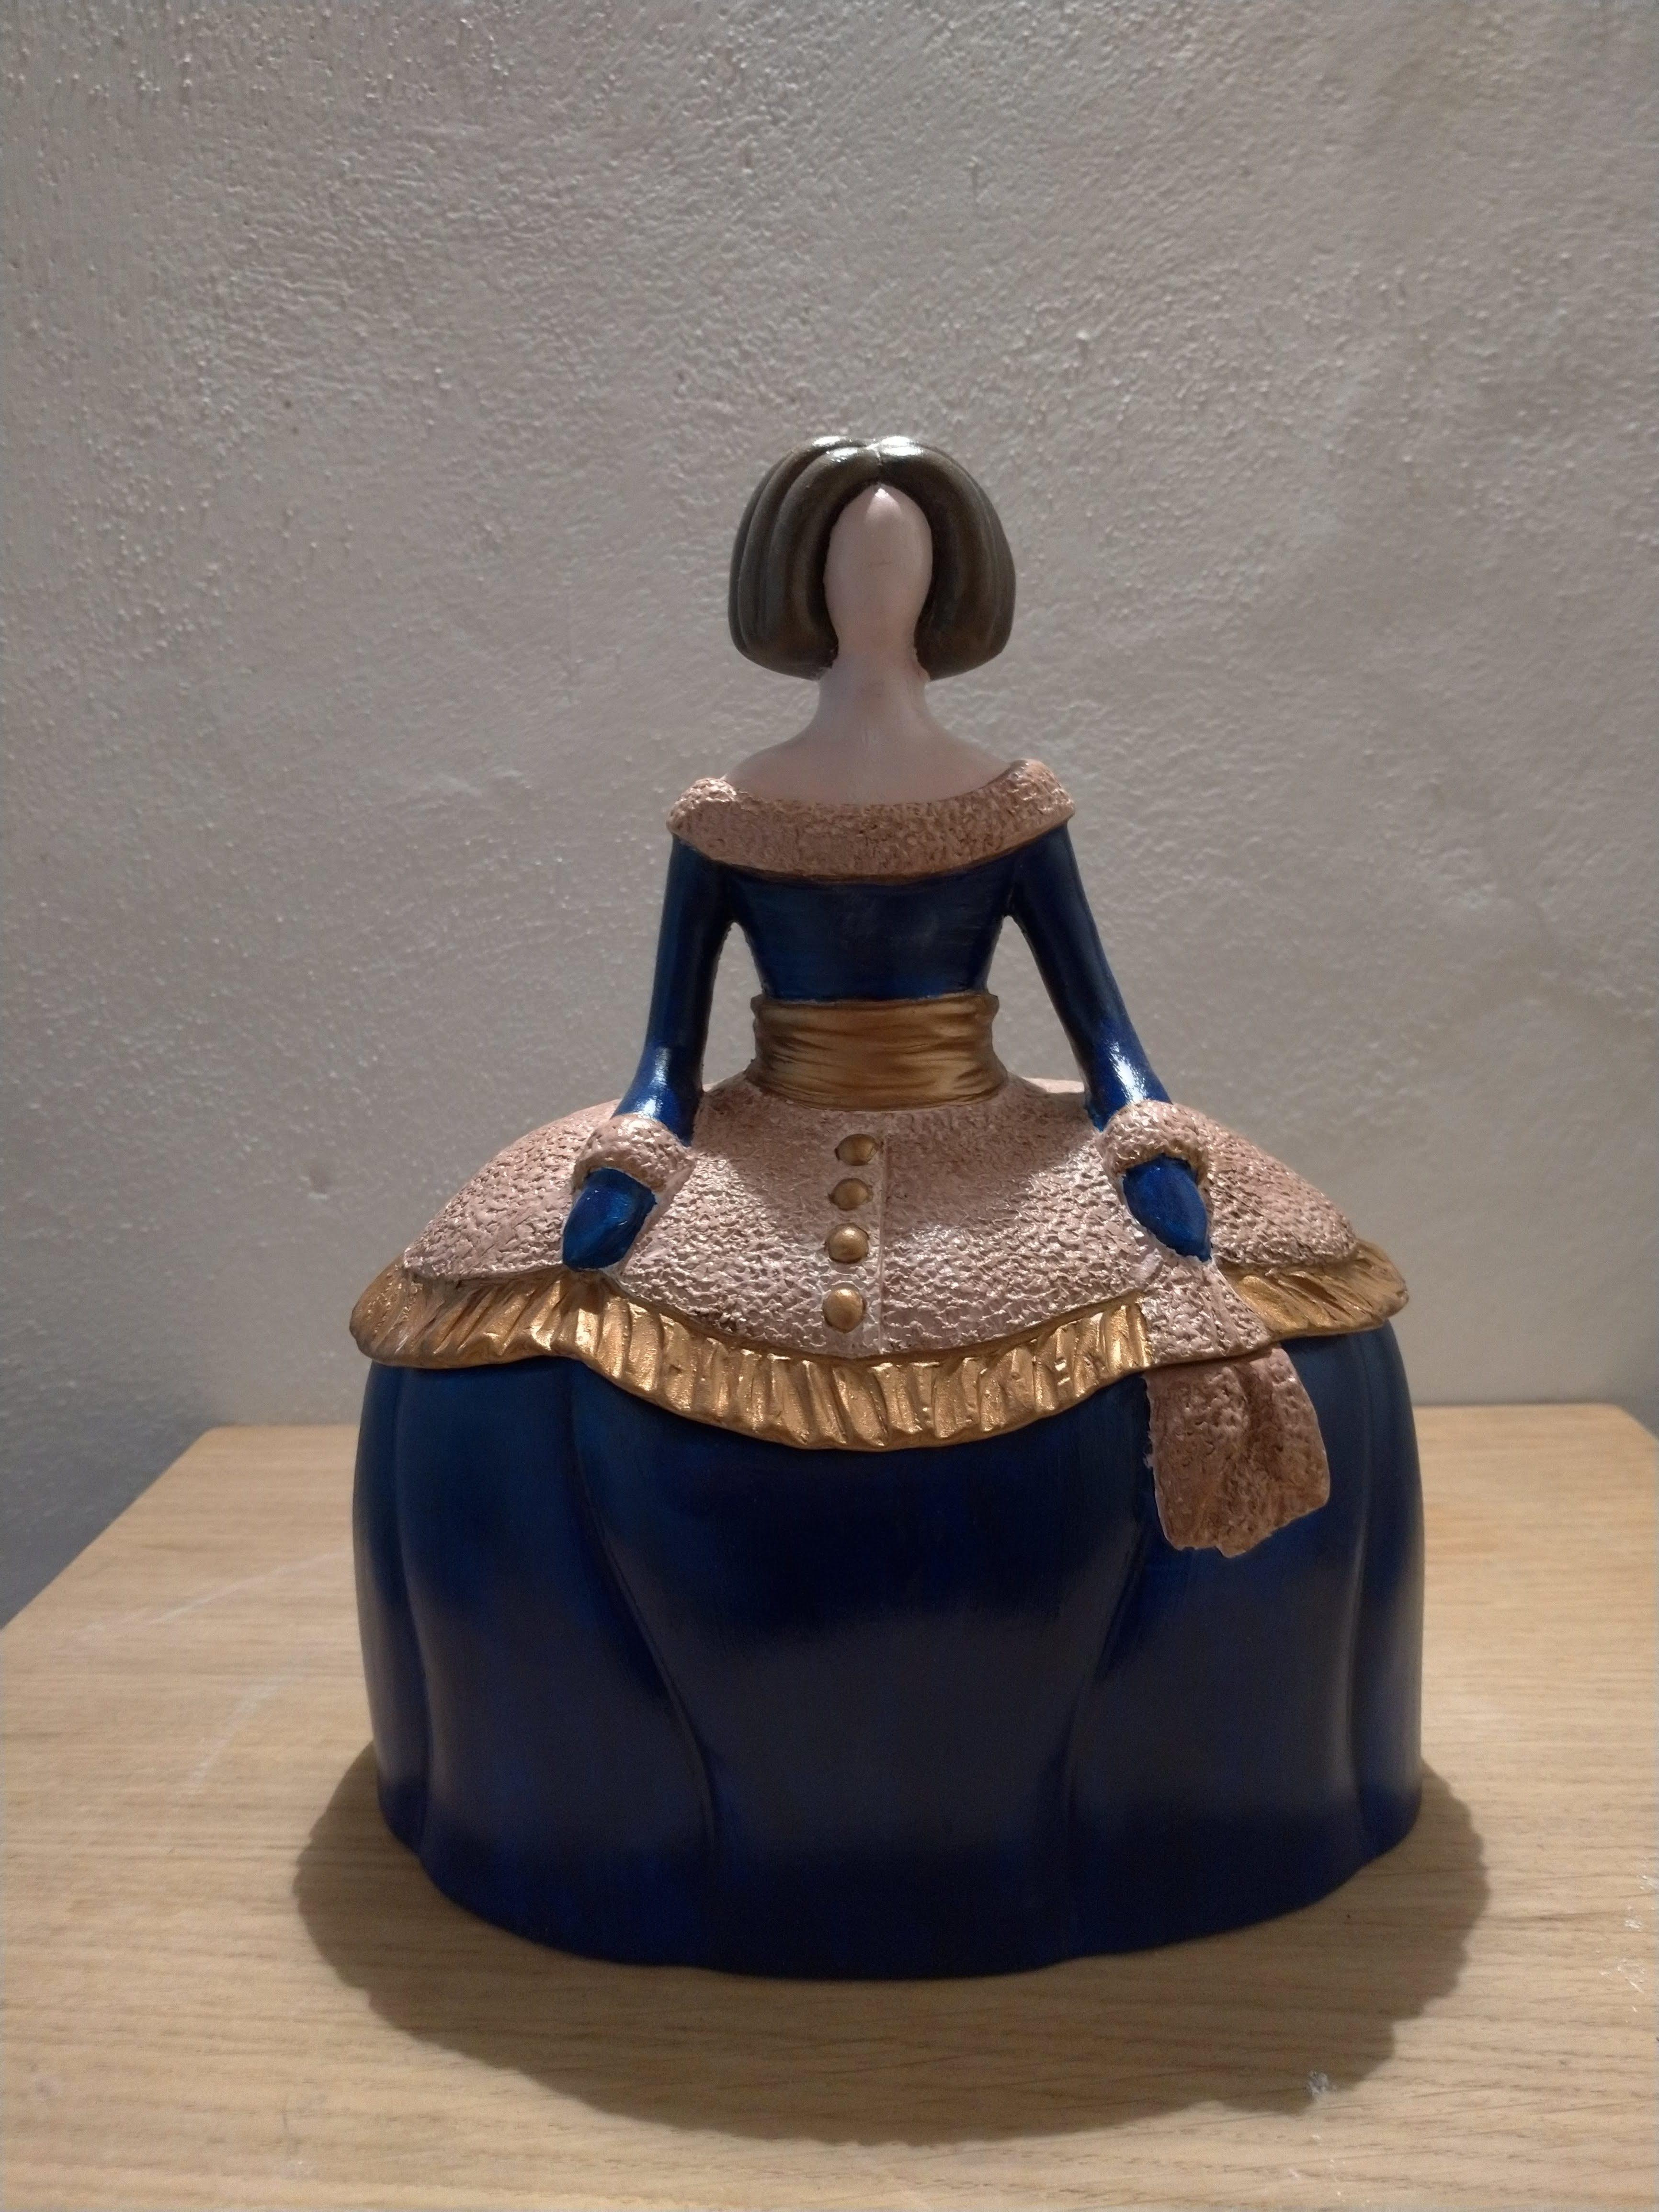 Dama portagioie in ceramica / Jewel case figurine